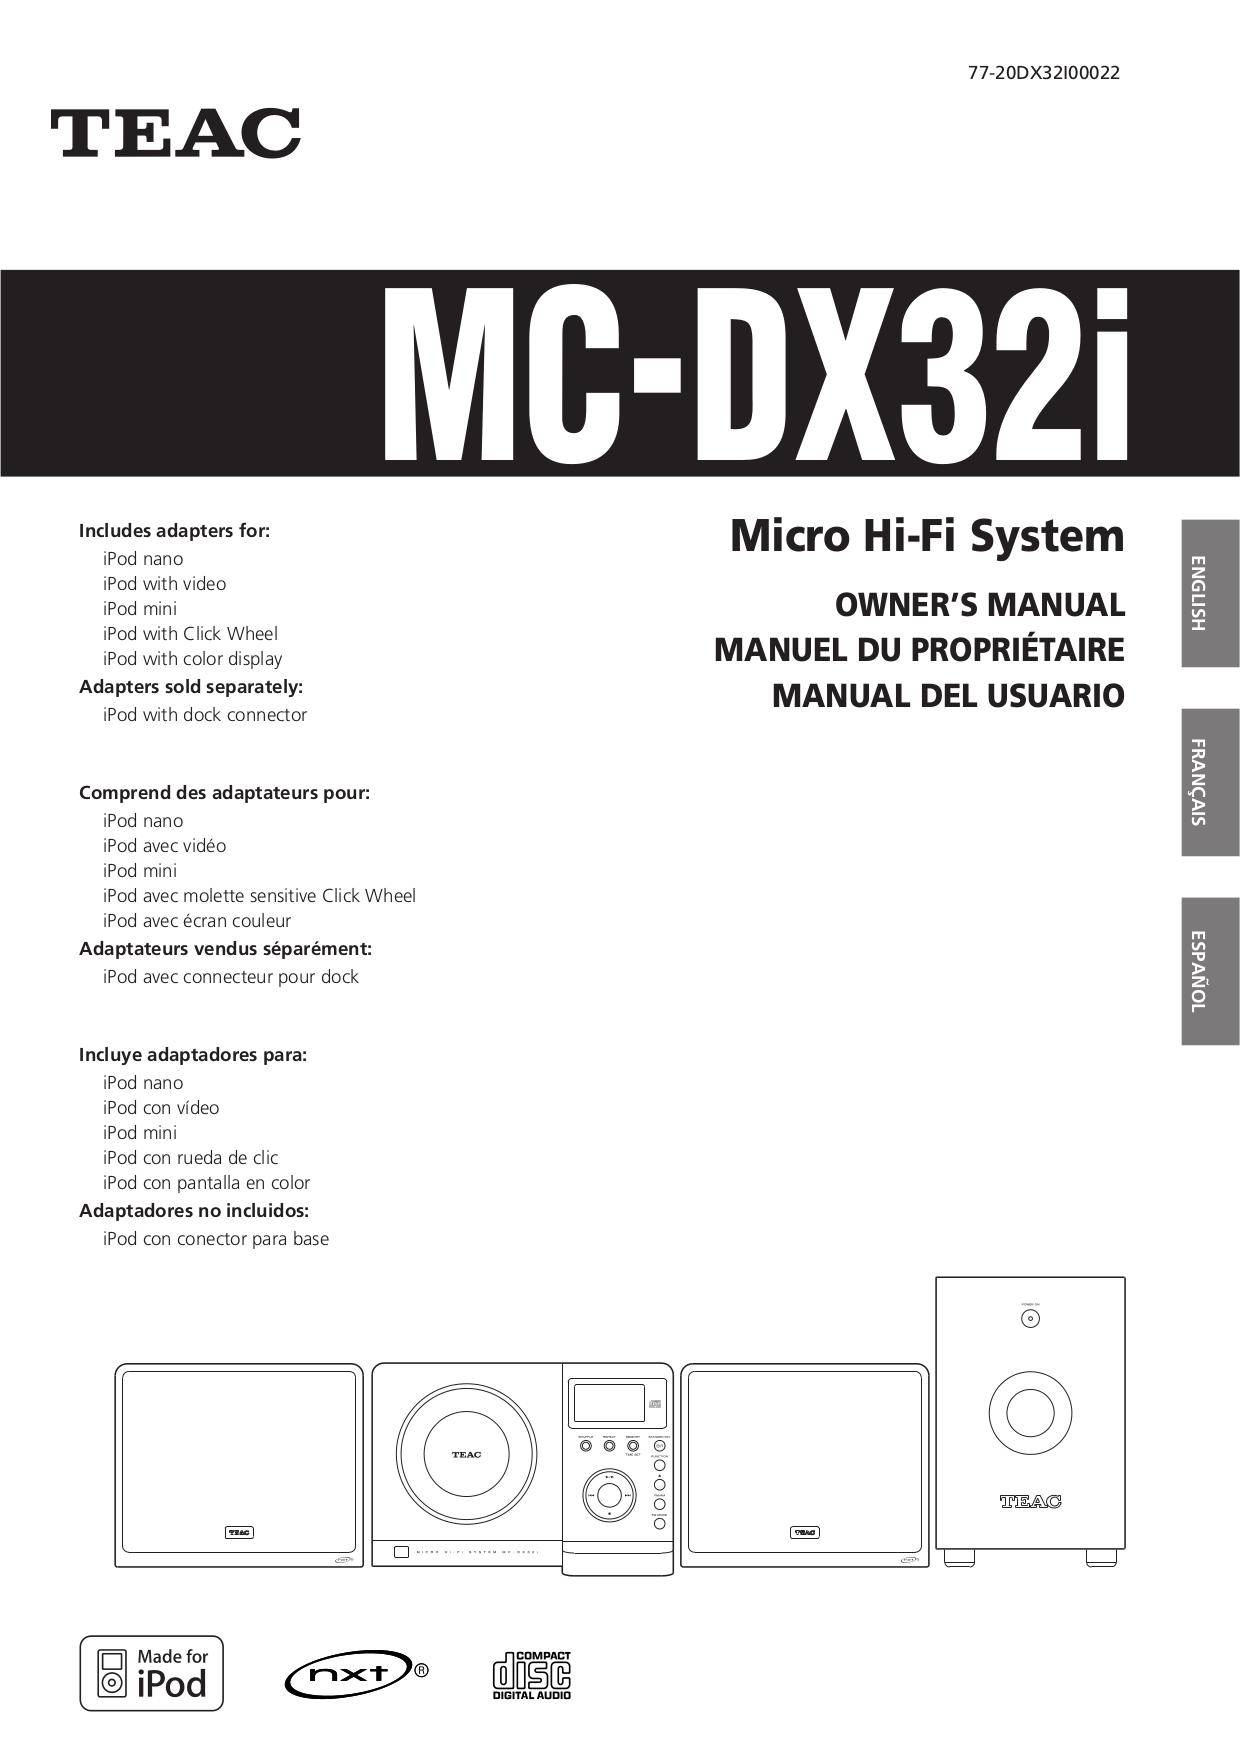 pdf for Teac Other MC-DX32I Hi-Fi System manual